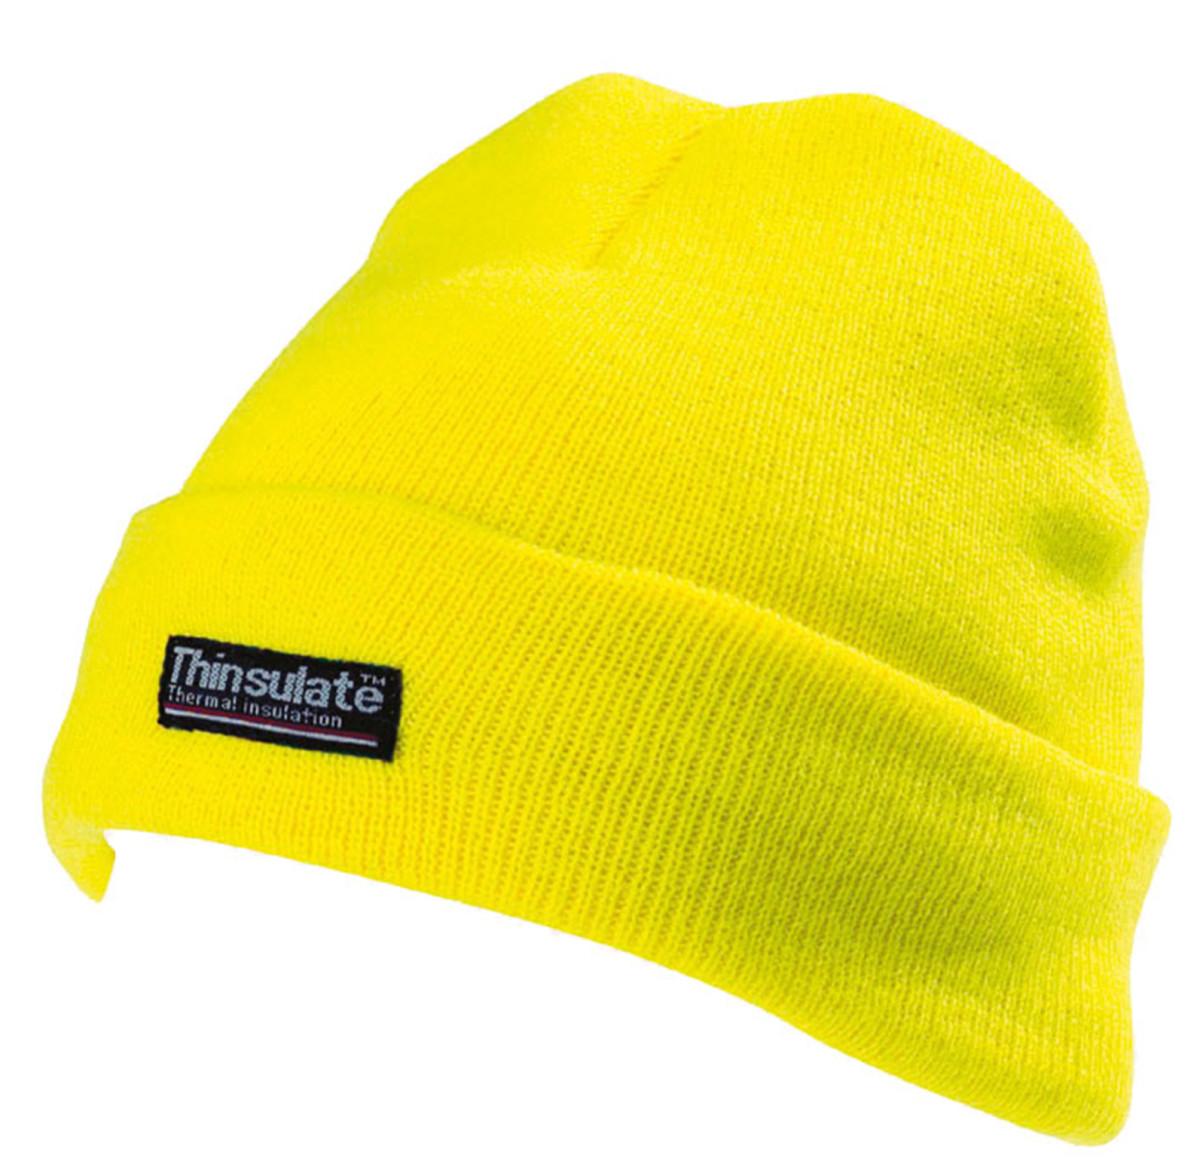 Hi-Vis 3M Thinsulate Hat